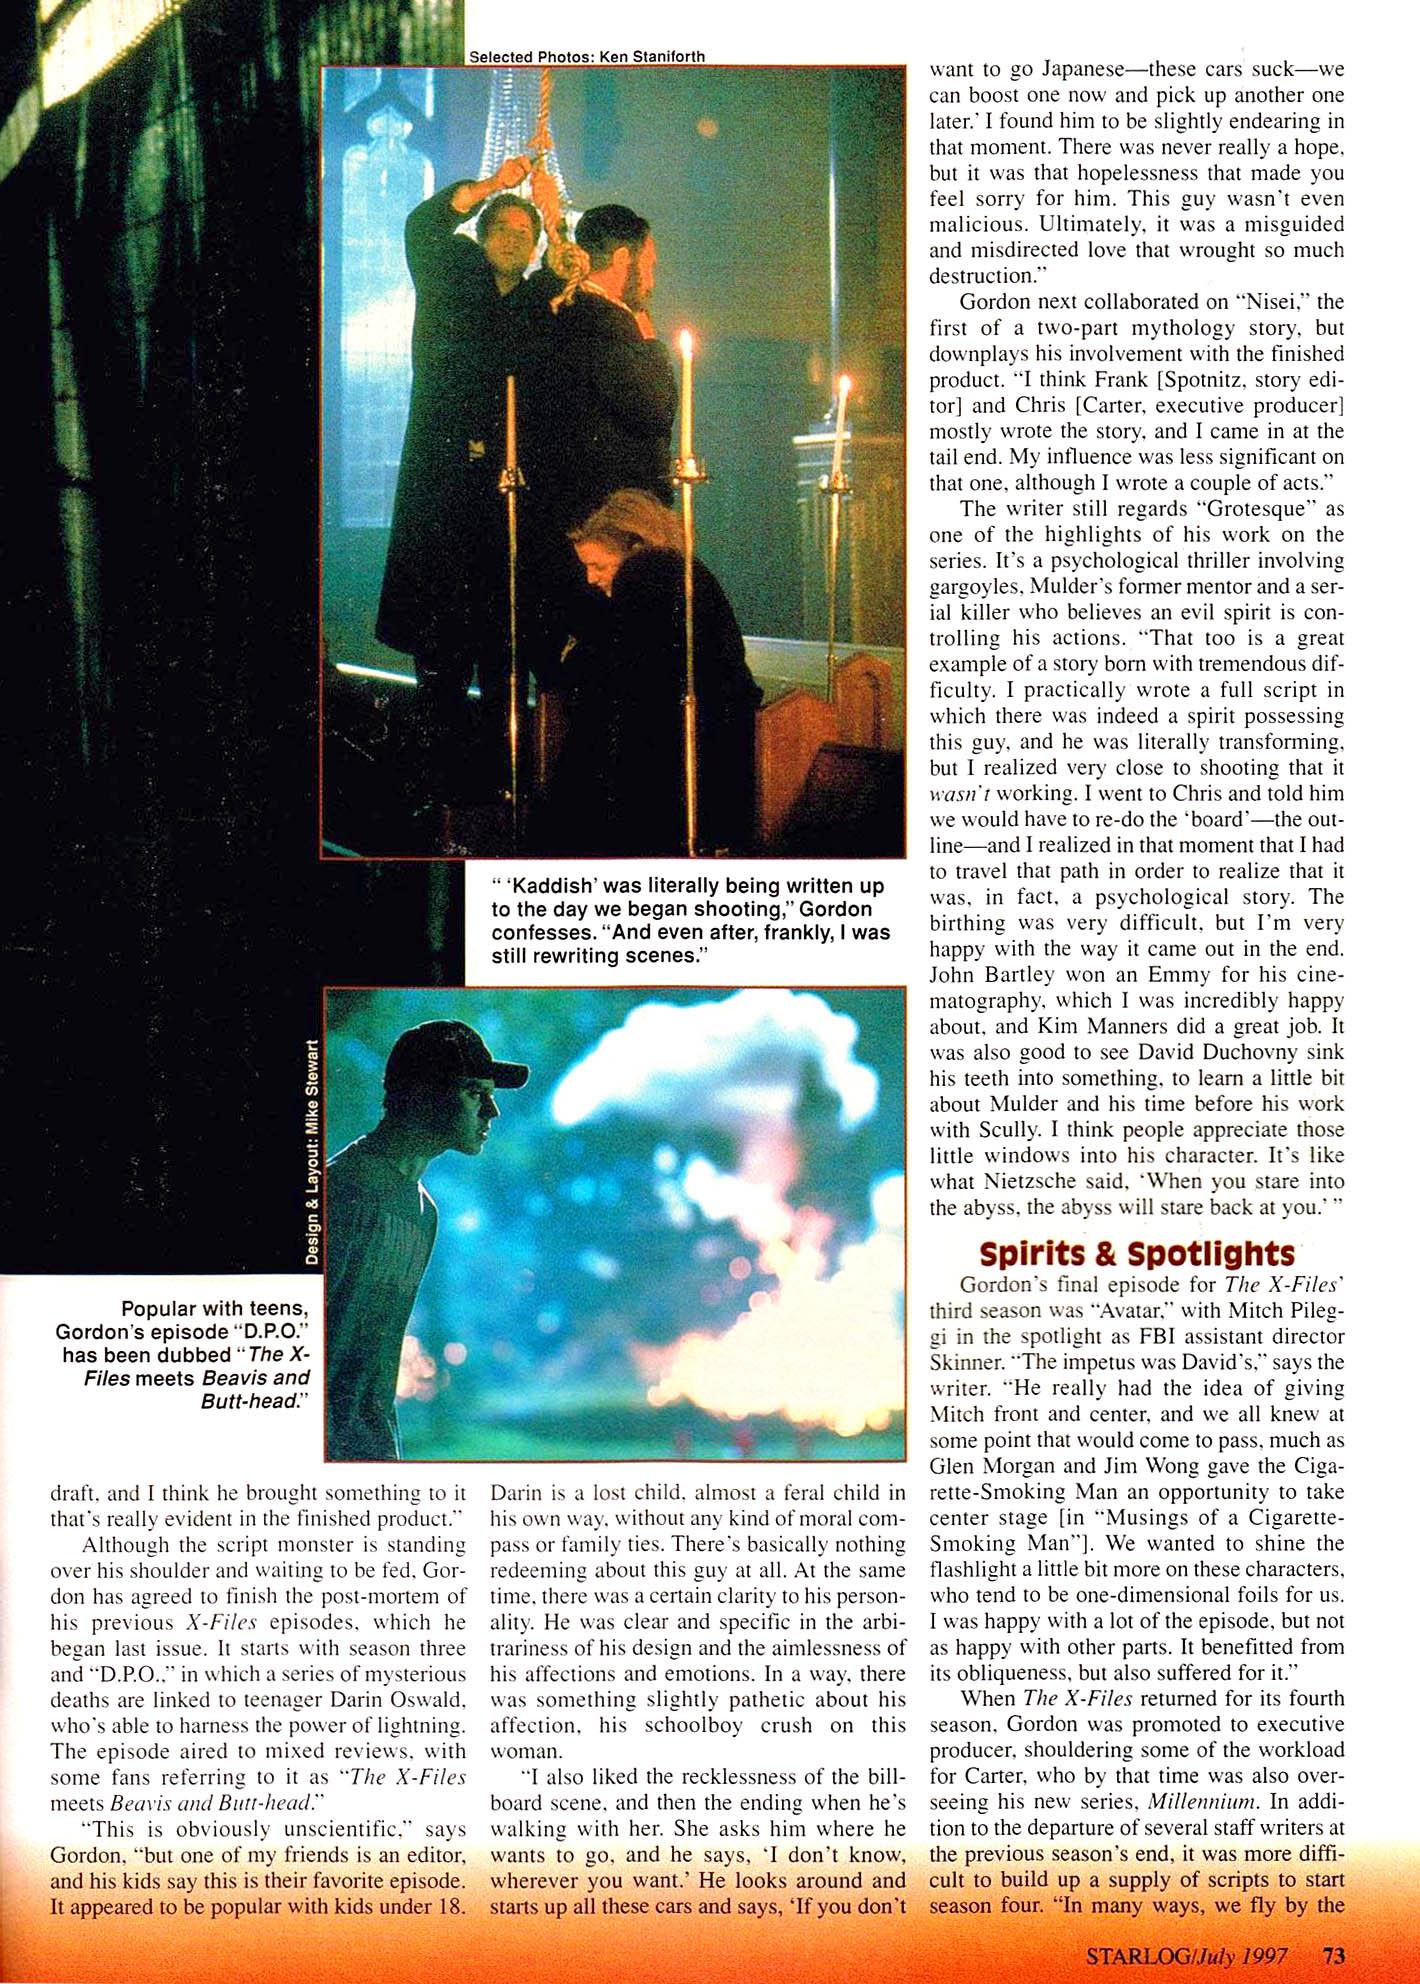 Starlog 240 1997 07 X-Files-2.jpg